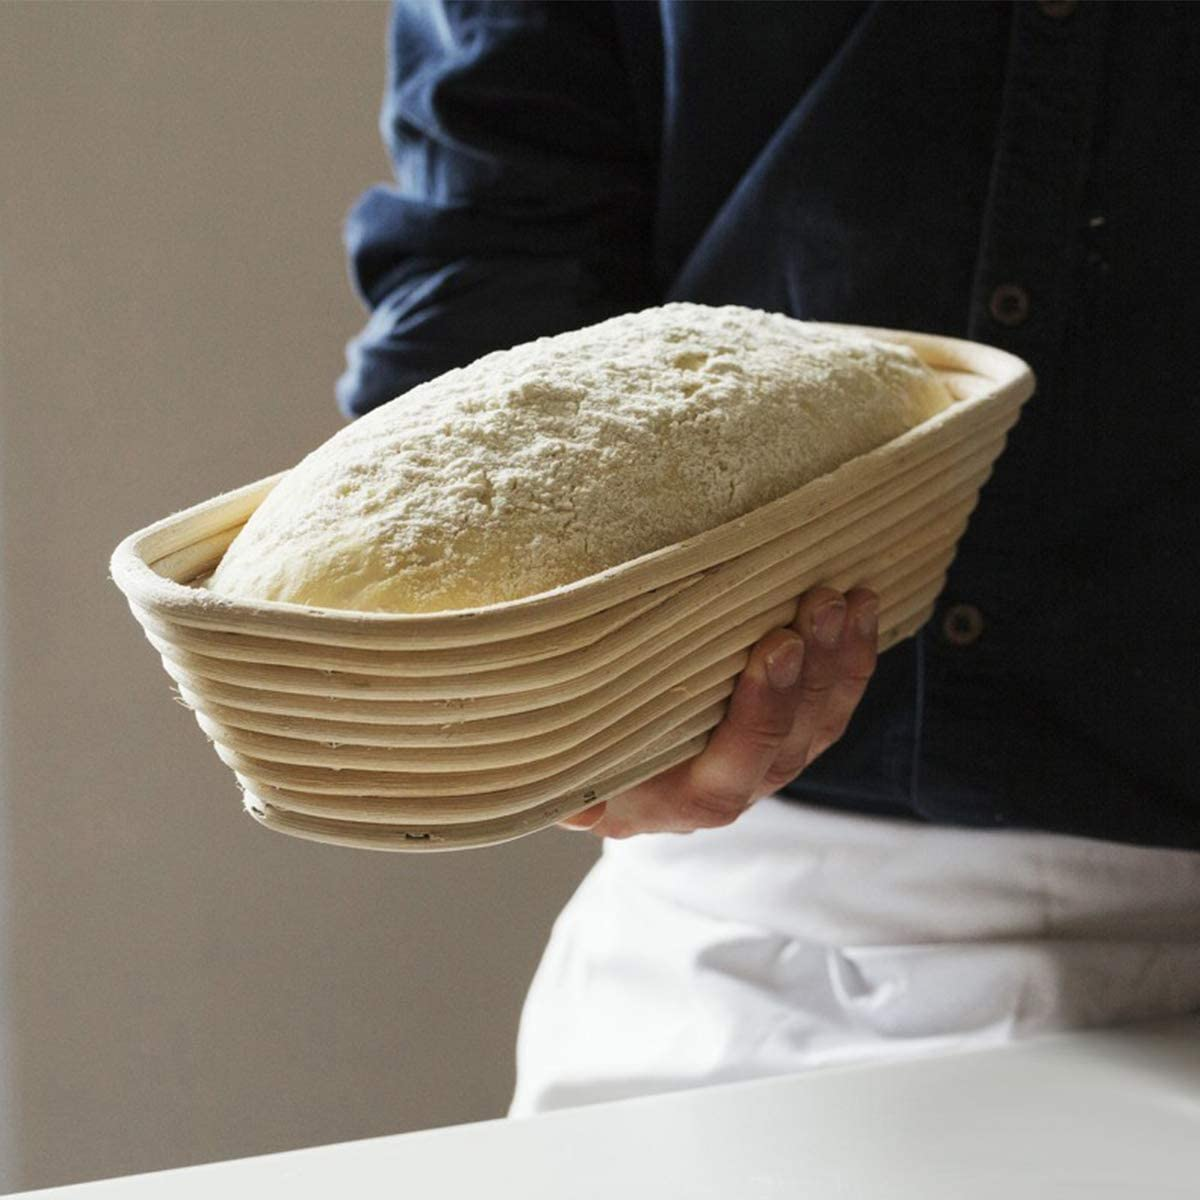 Litthing 2 Pcs G/ärkorb ovales G/ärk/örbchen f/ür Brot 25 x 15cm Banneton Korb,G/ärkorb aus Peddigrohr,Brotform G/ärkorb mit Teigschaber und Leinensatz f/ür selbstgemachtes Brot